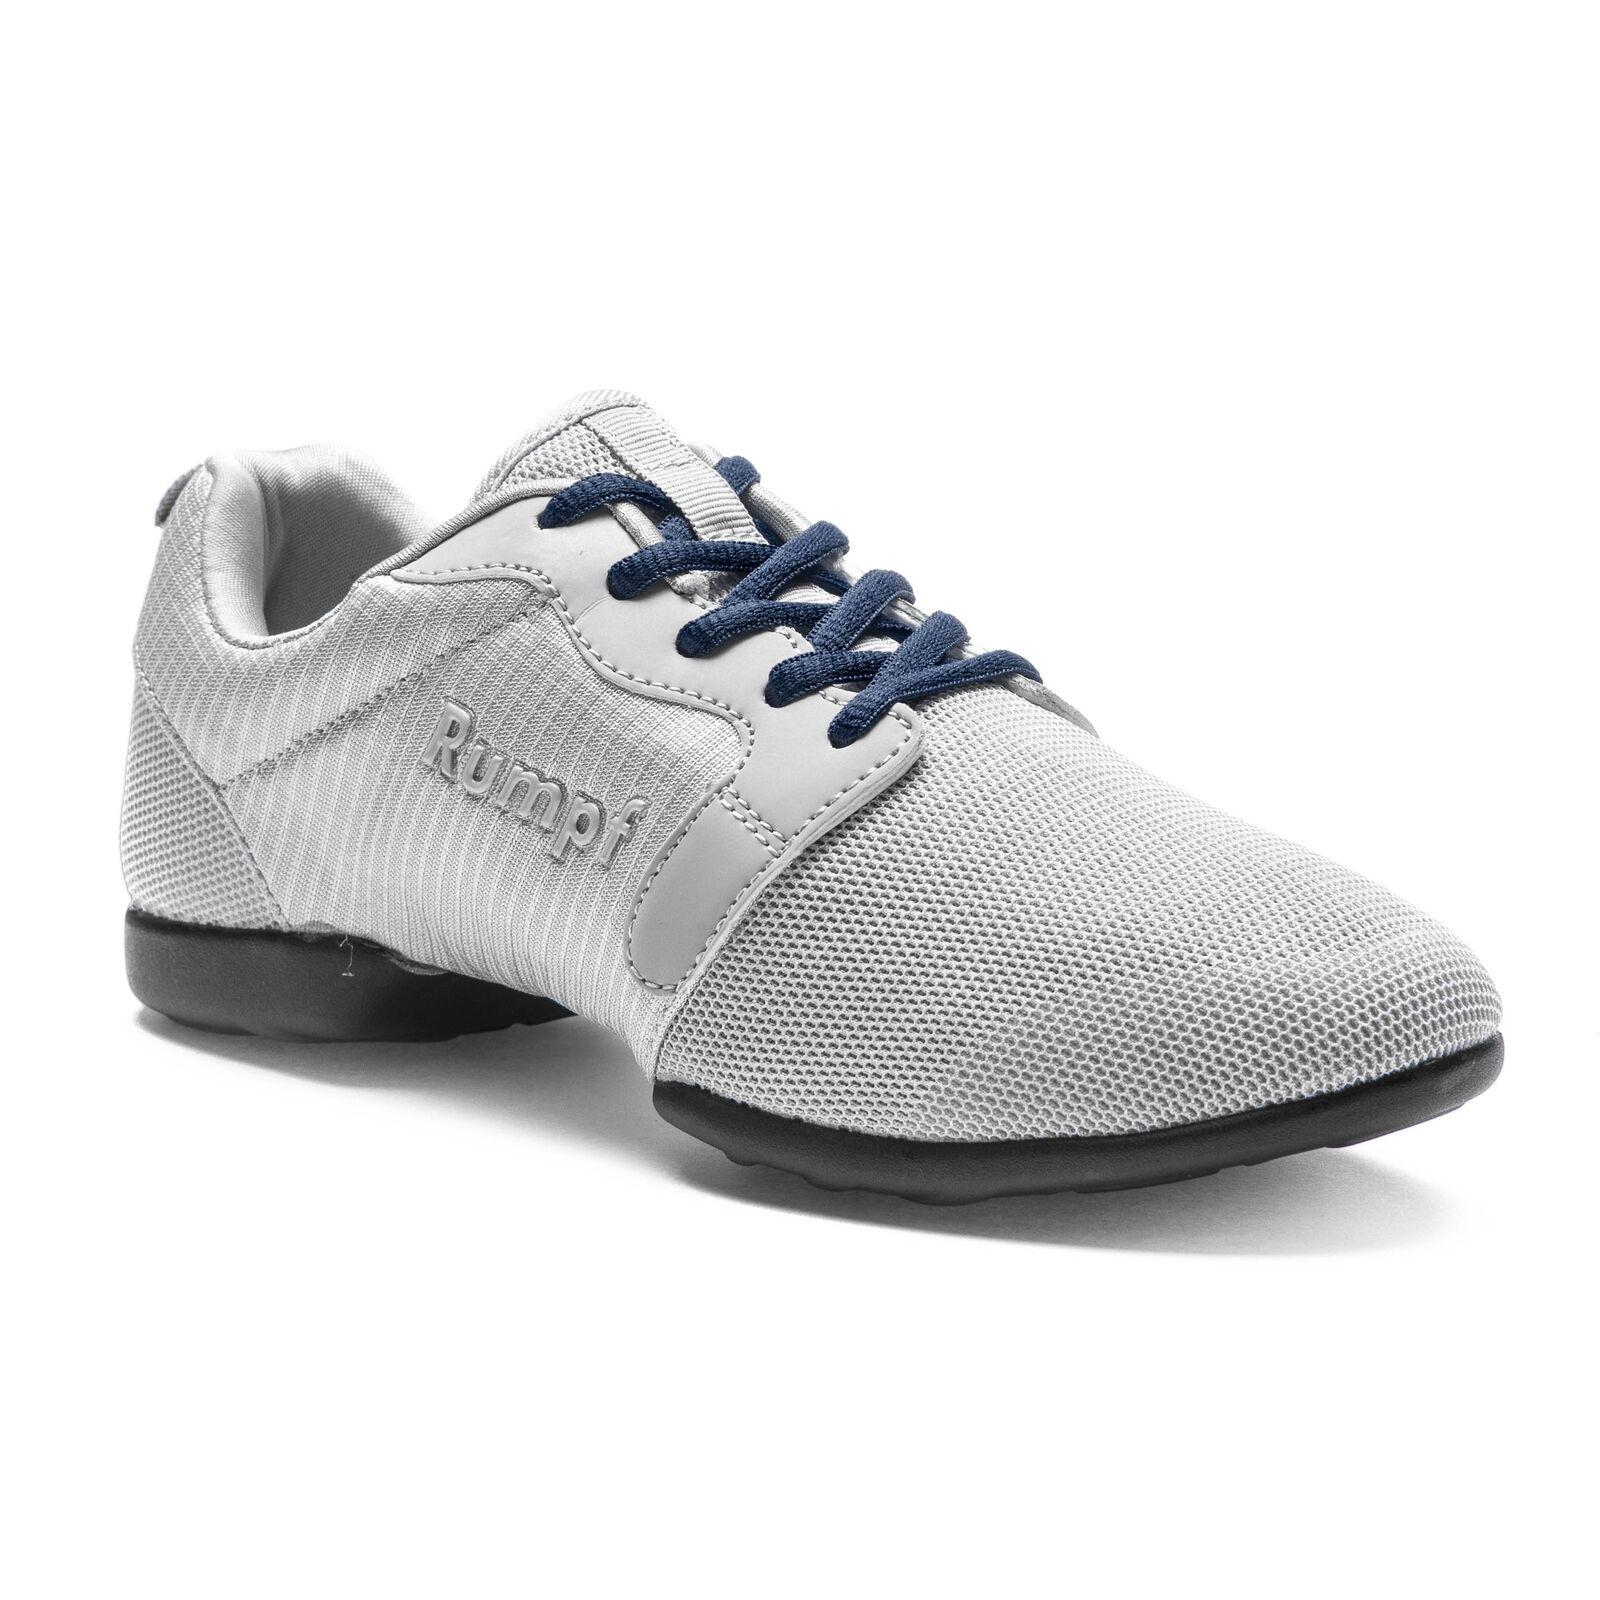 Rumpf Mojo Dance Lindy Hop Swing Tanz Trainings Schuh grau blaue Schnürsenkel